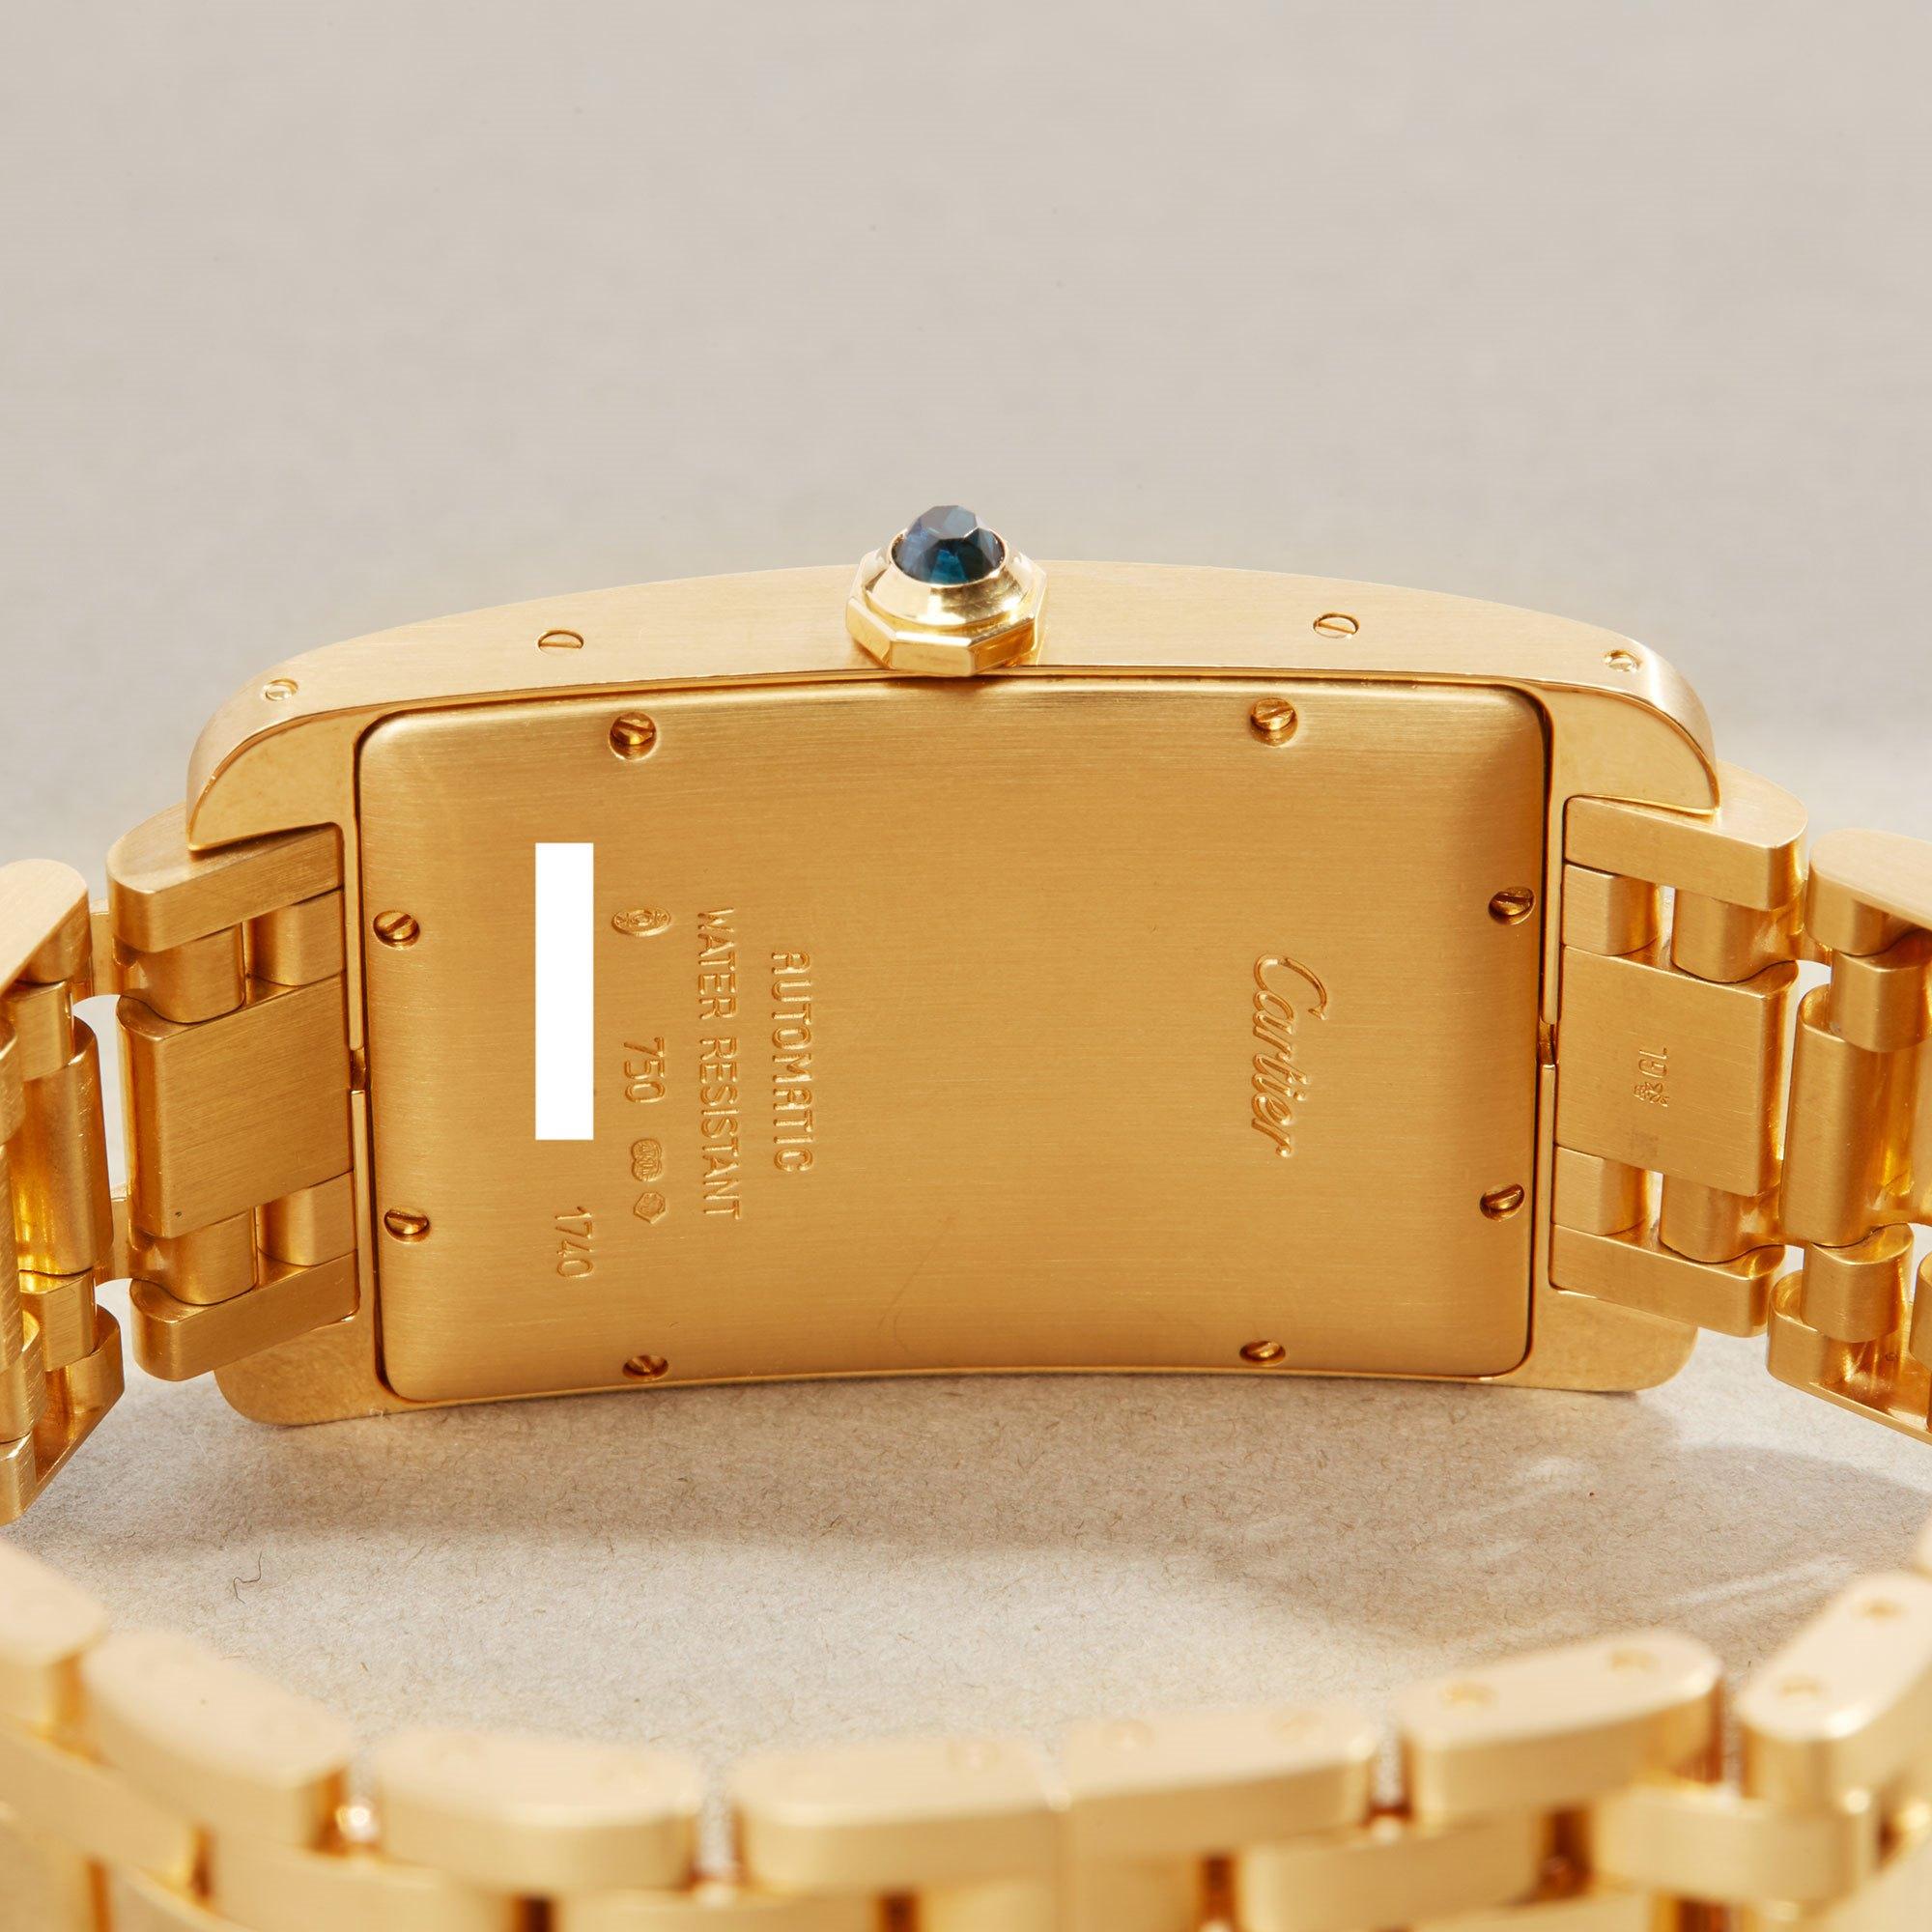 Cartier Tank Americaine XL 18K Yellow Gold 1740